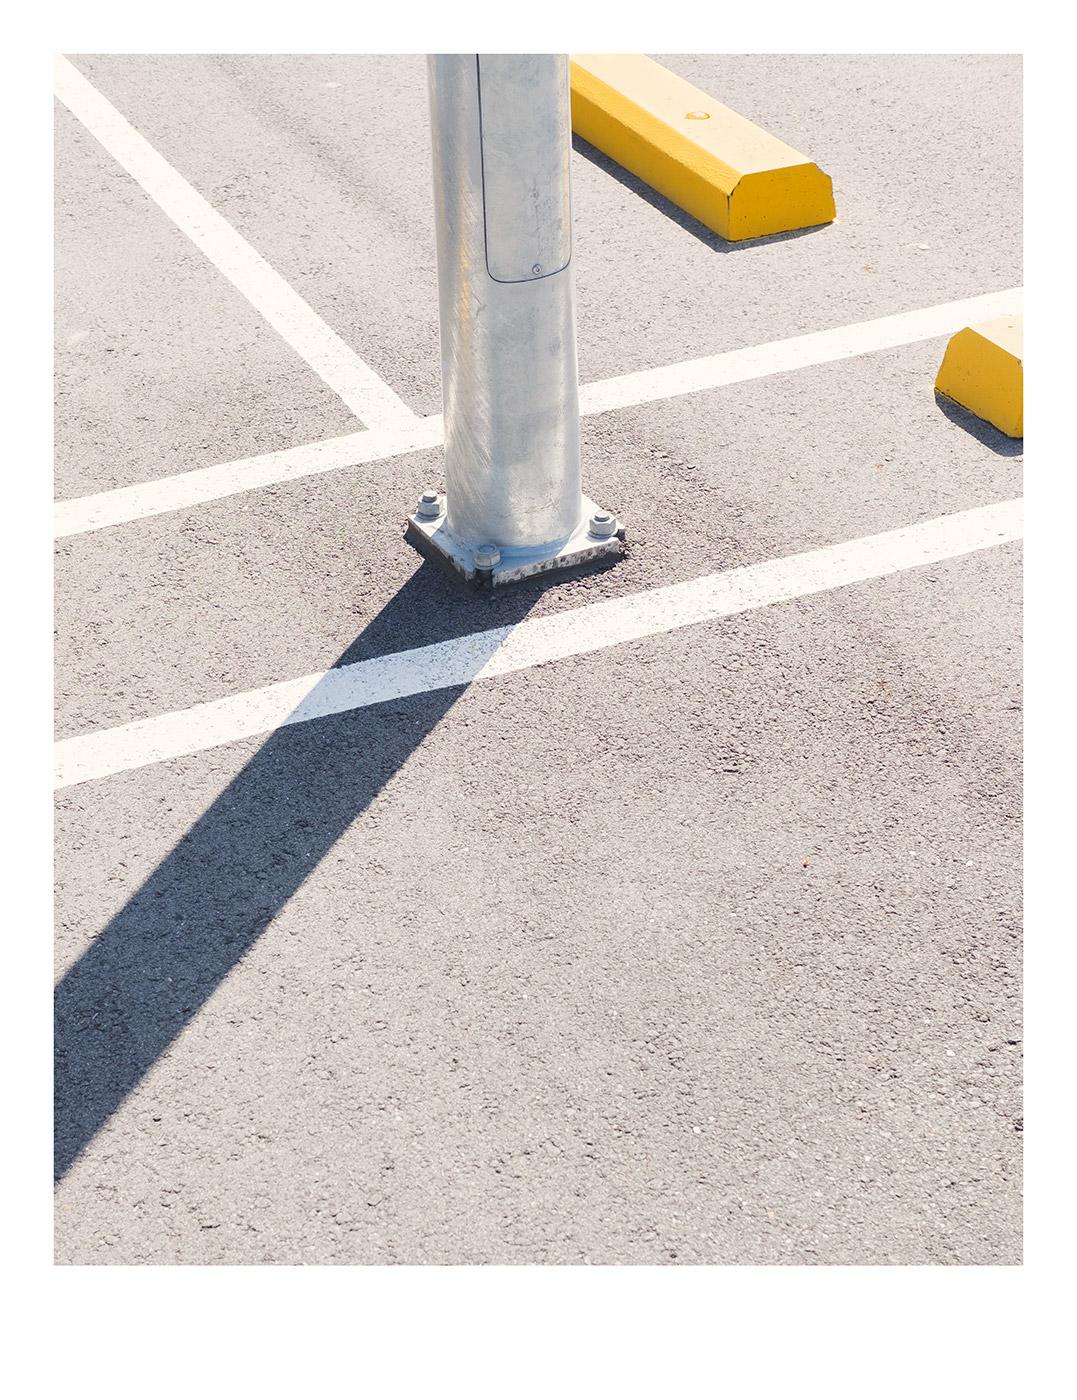 Carpark-1-daniel-hine-sunshine-coast-fine-art-photographer.jpg